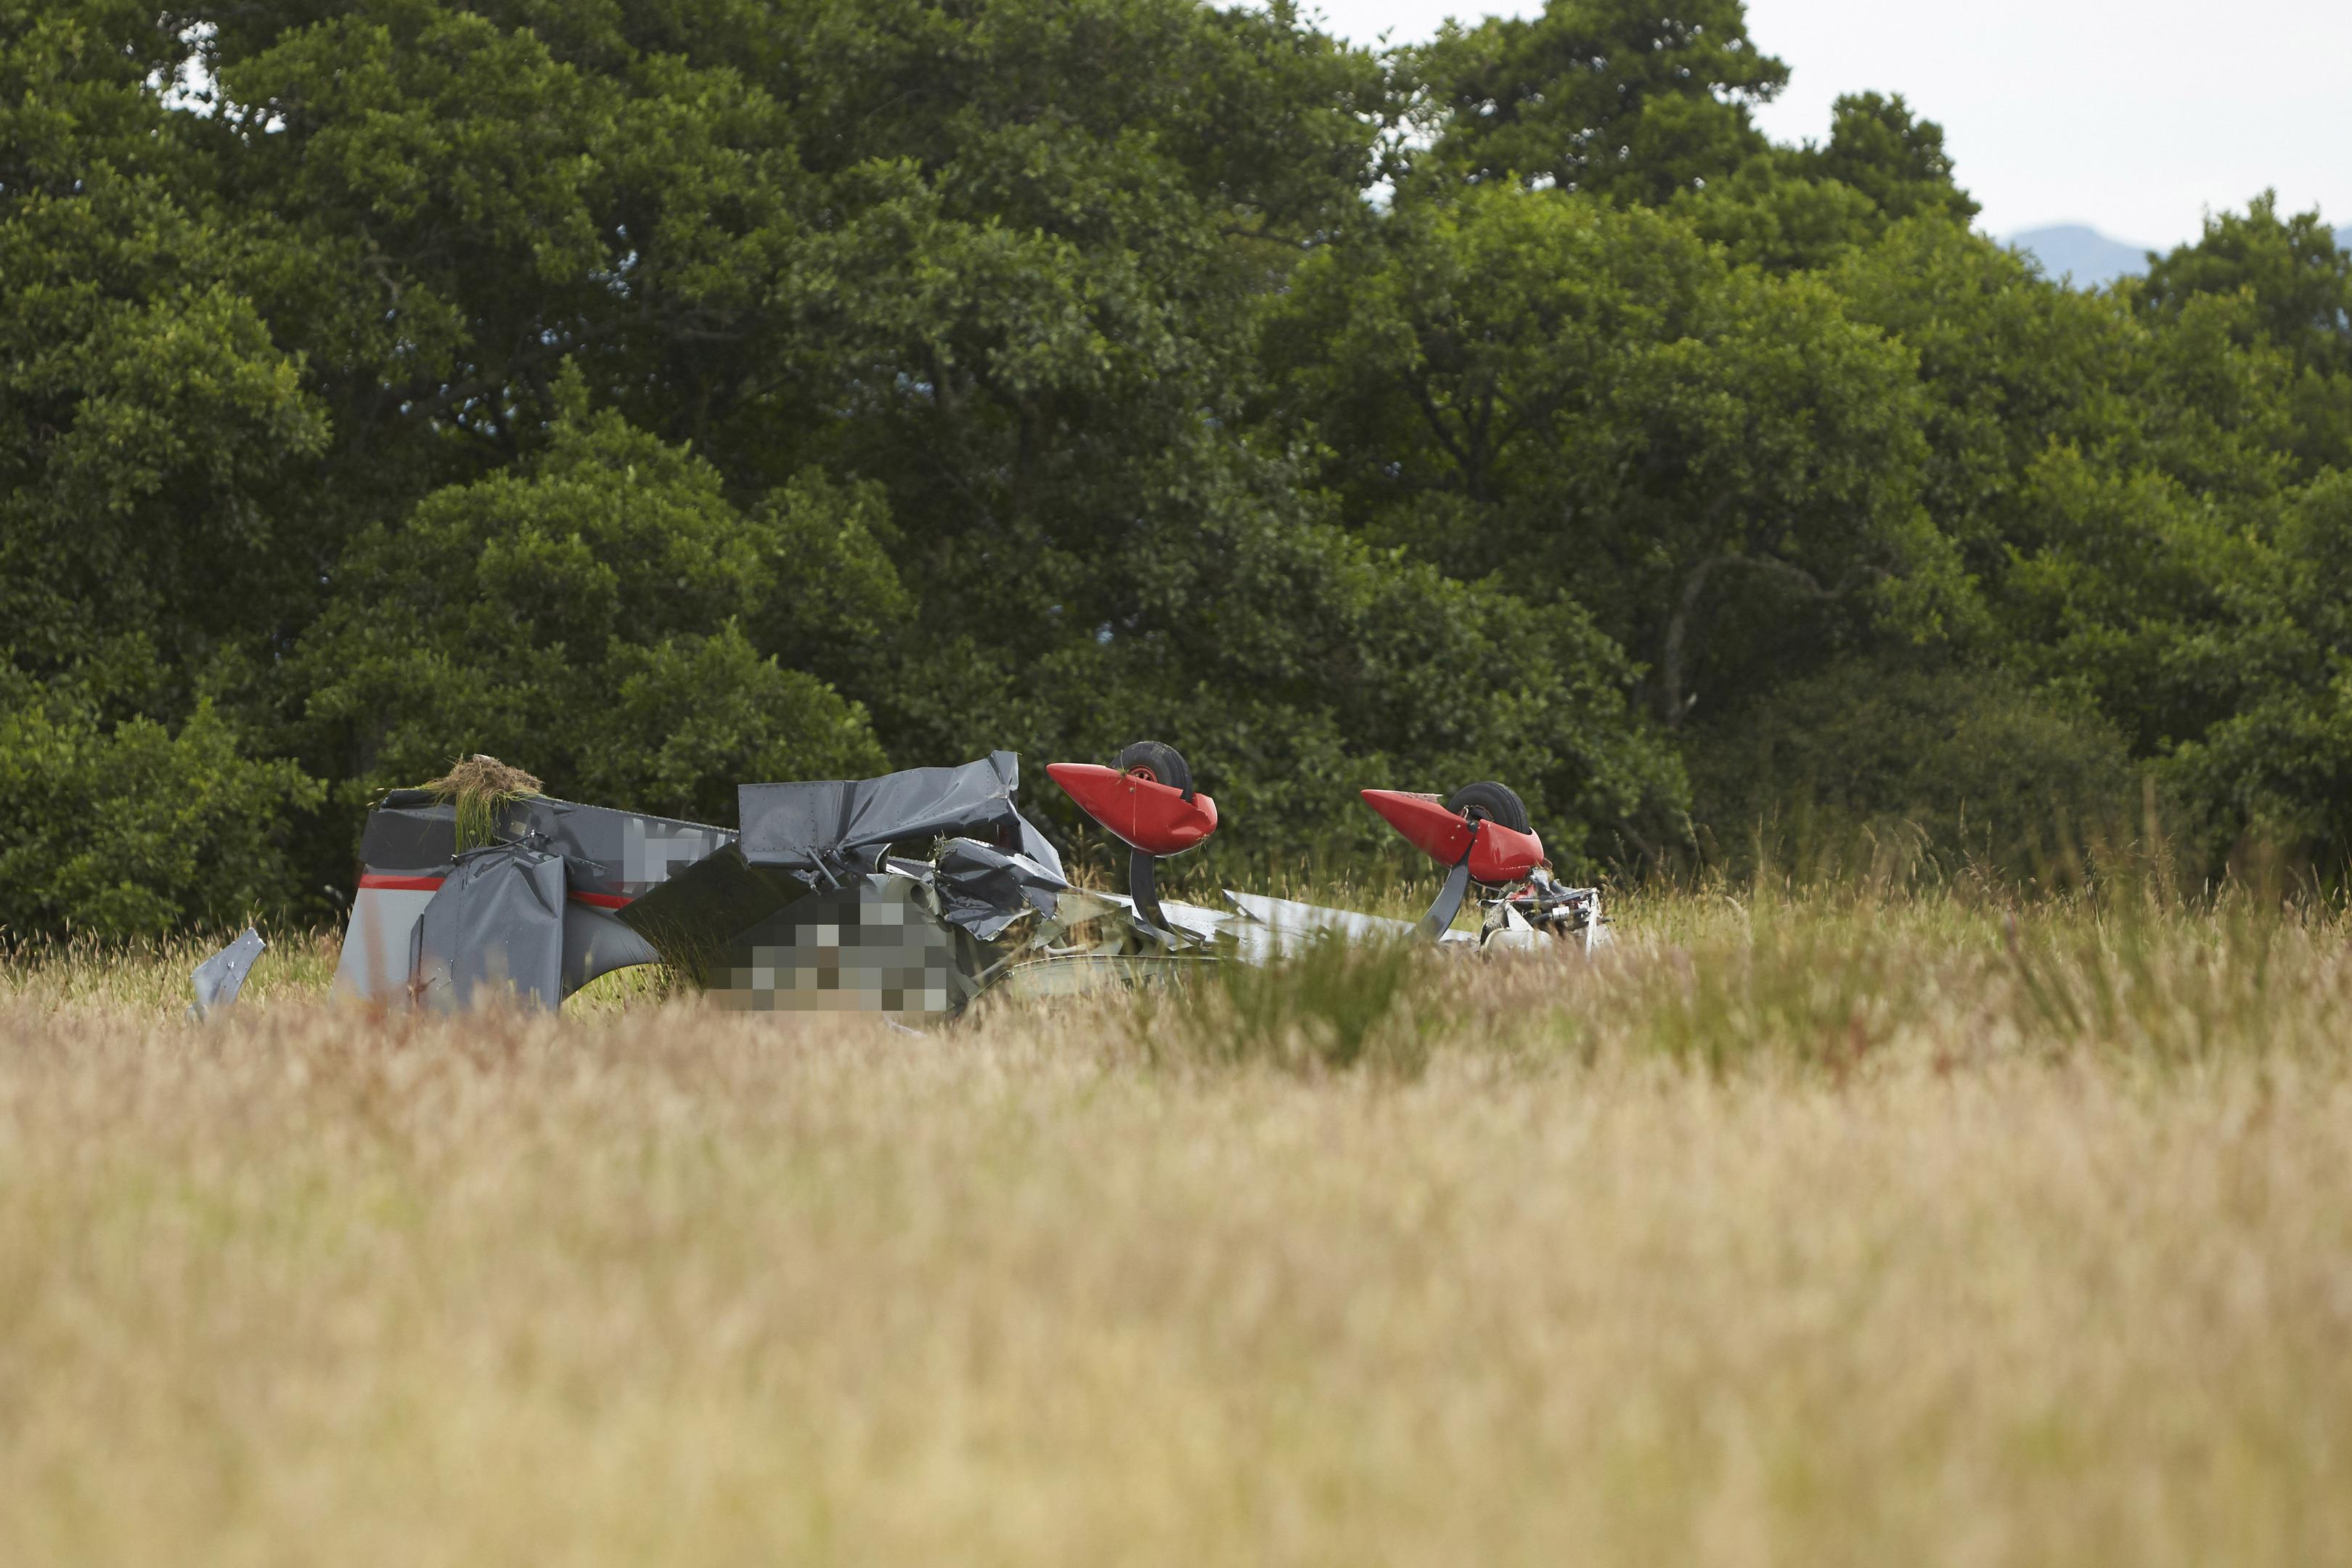 Crashed plane wreckage at Lochnell Estate in Argyll